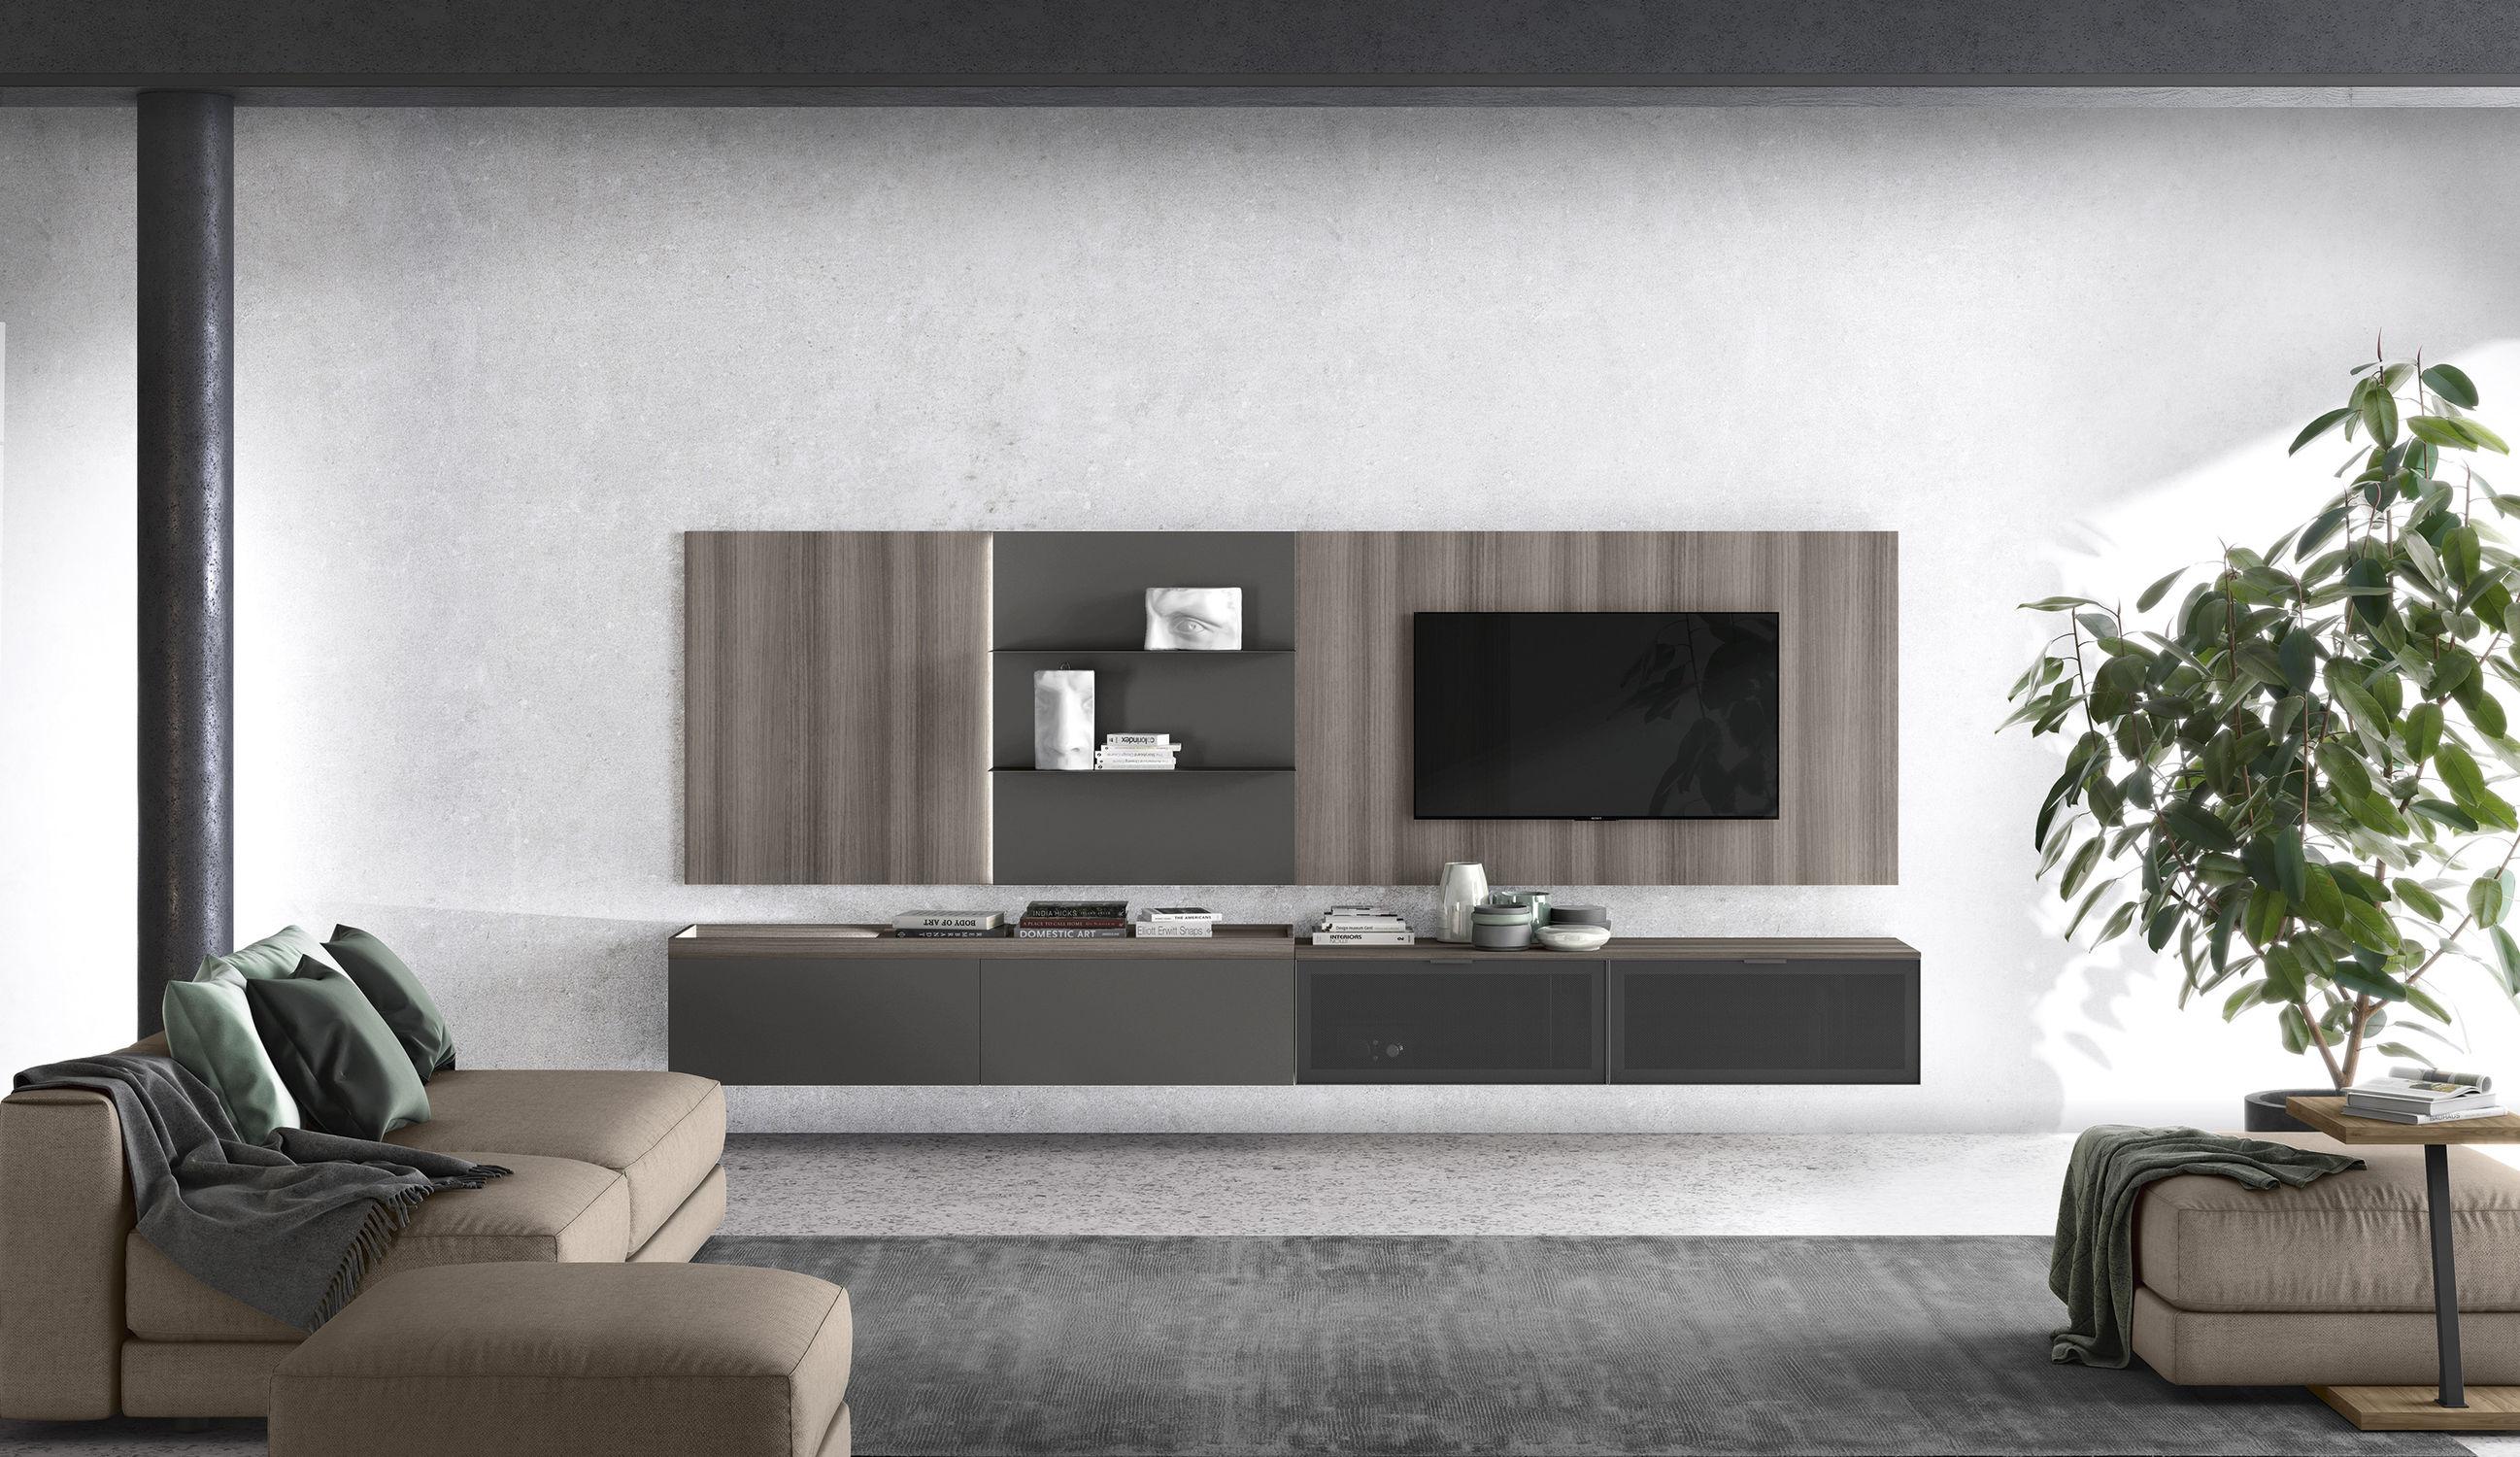 Contemporary Tv Wall Unit Vitalyty Luce C12 Colombini Metal Melamine Modular